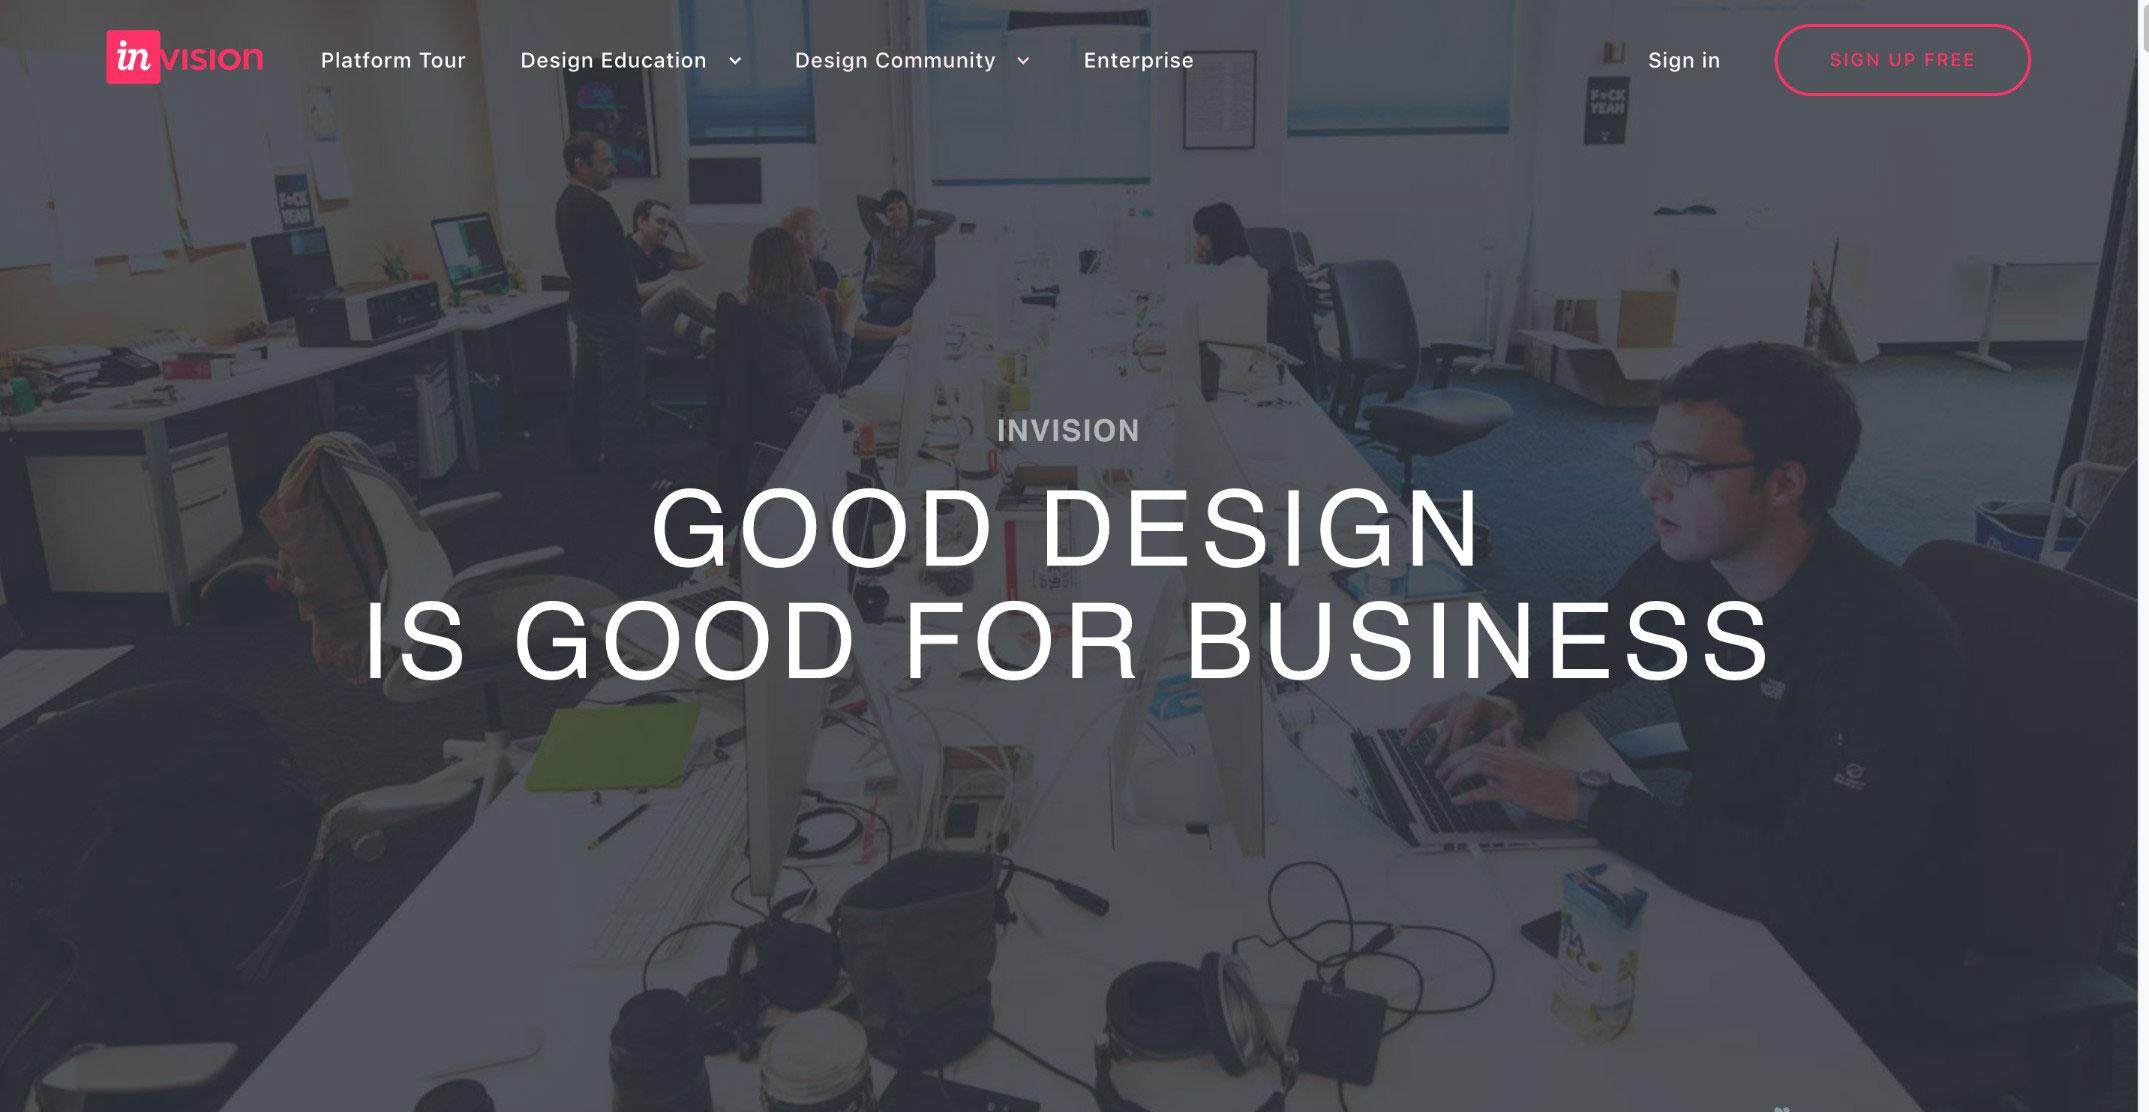 https://www.invisionapp.com/company